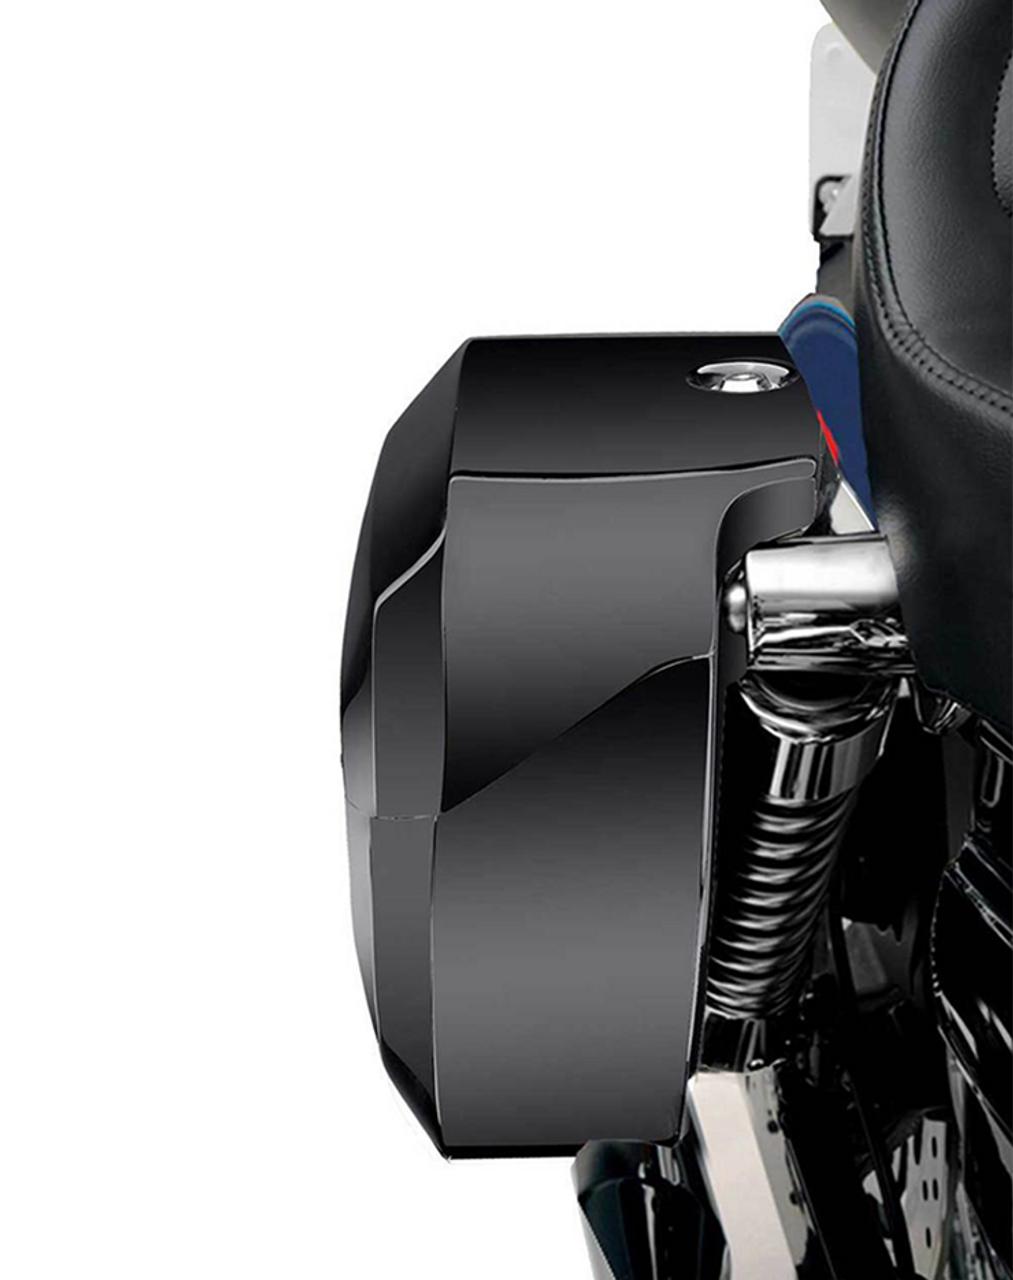 Honda VTX 1800 S Lamellar Extra Large Shock Cutout Saddlebag shock cutout view